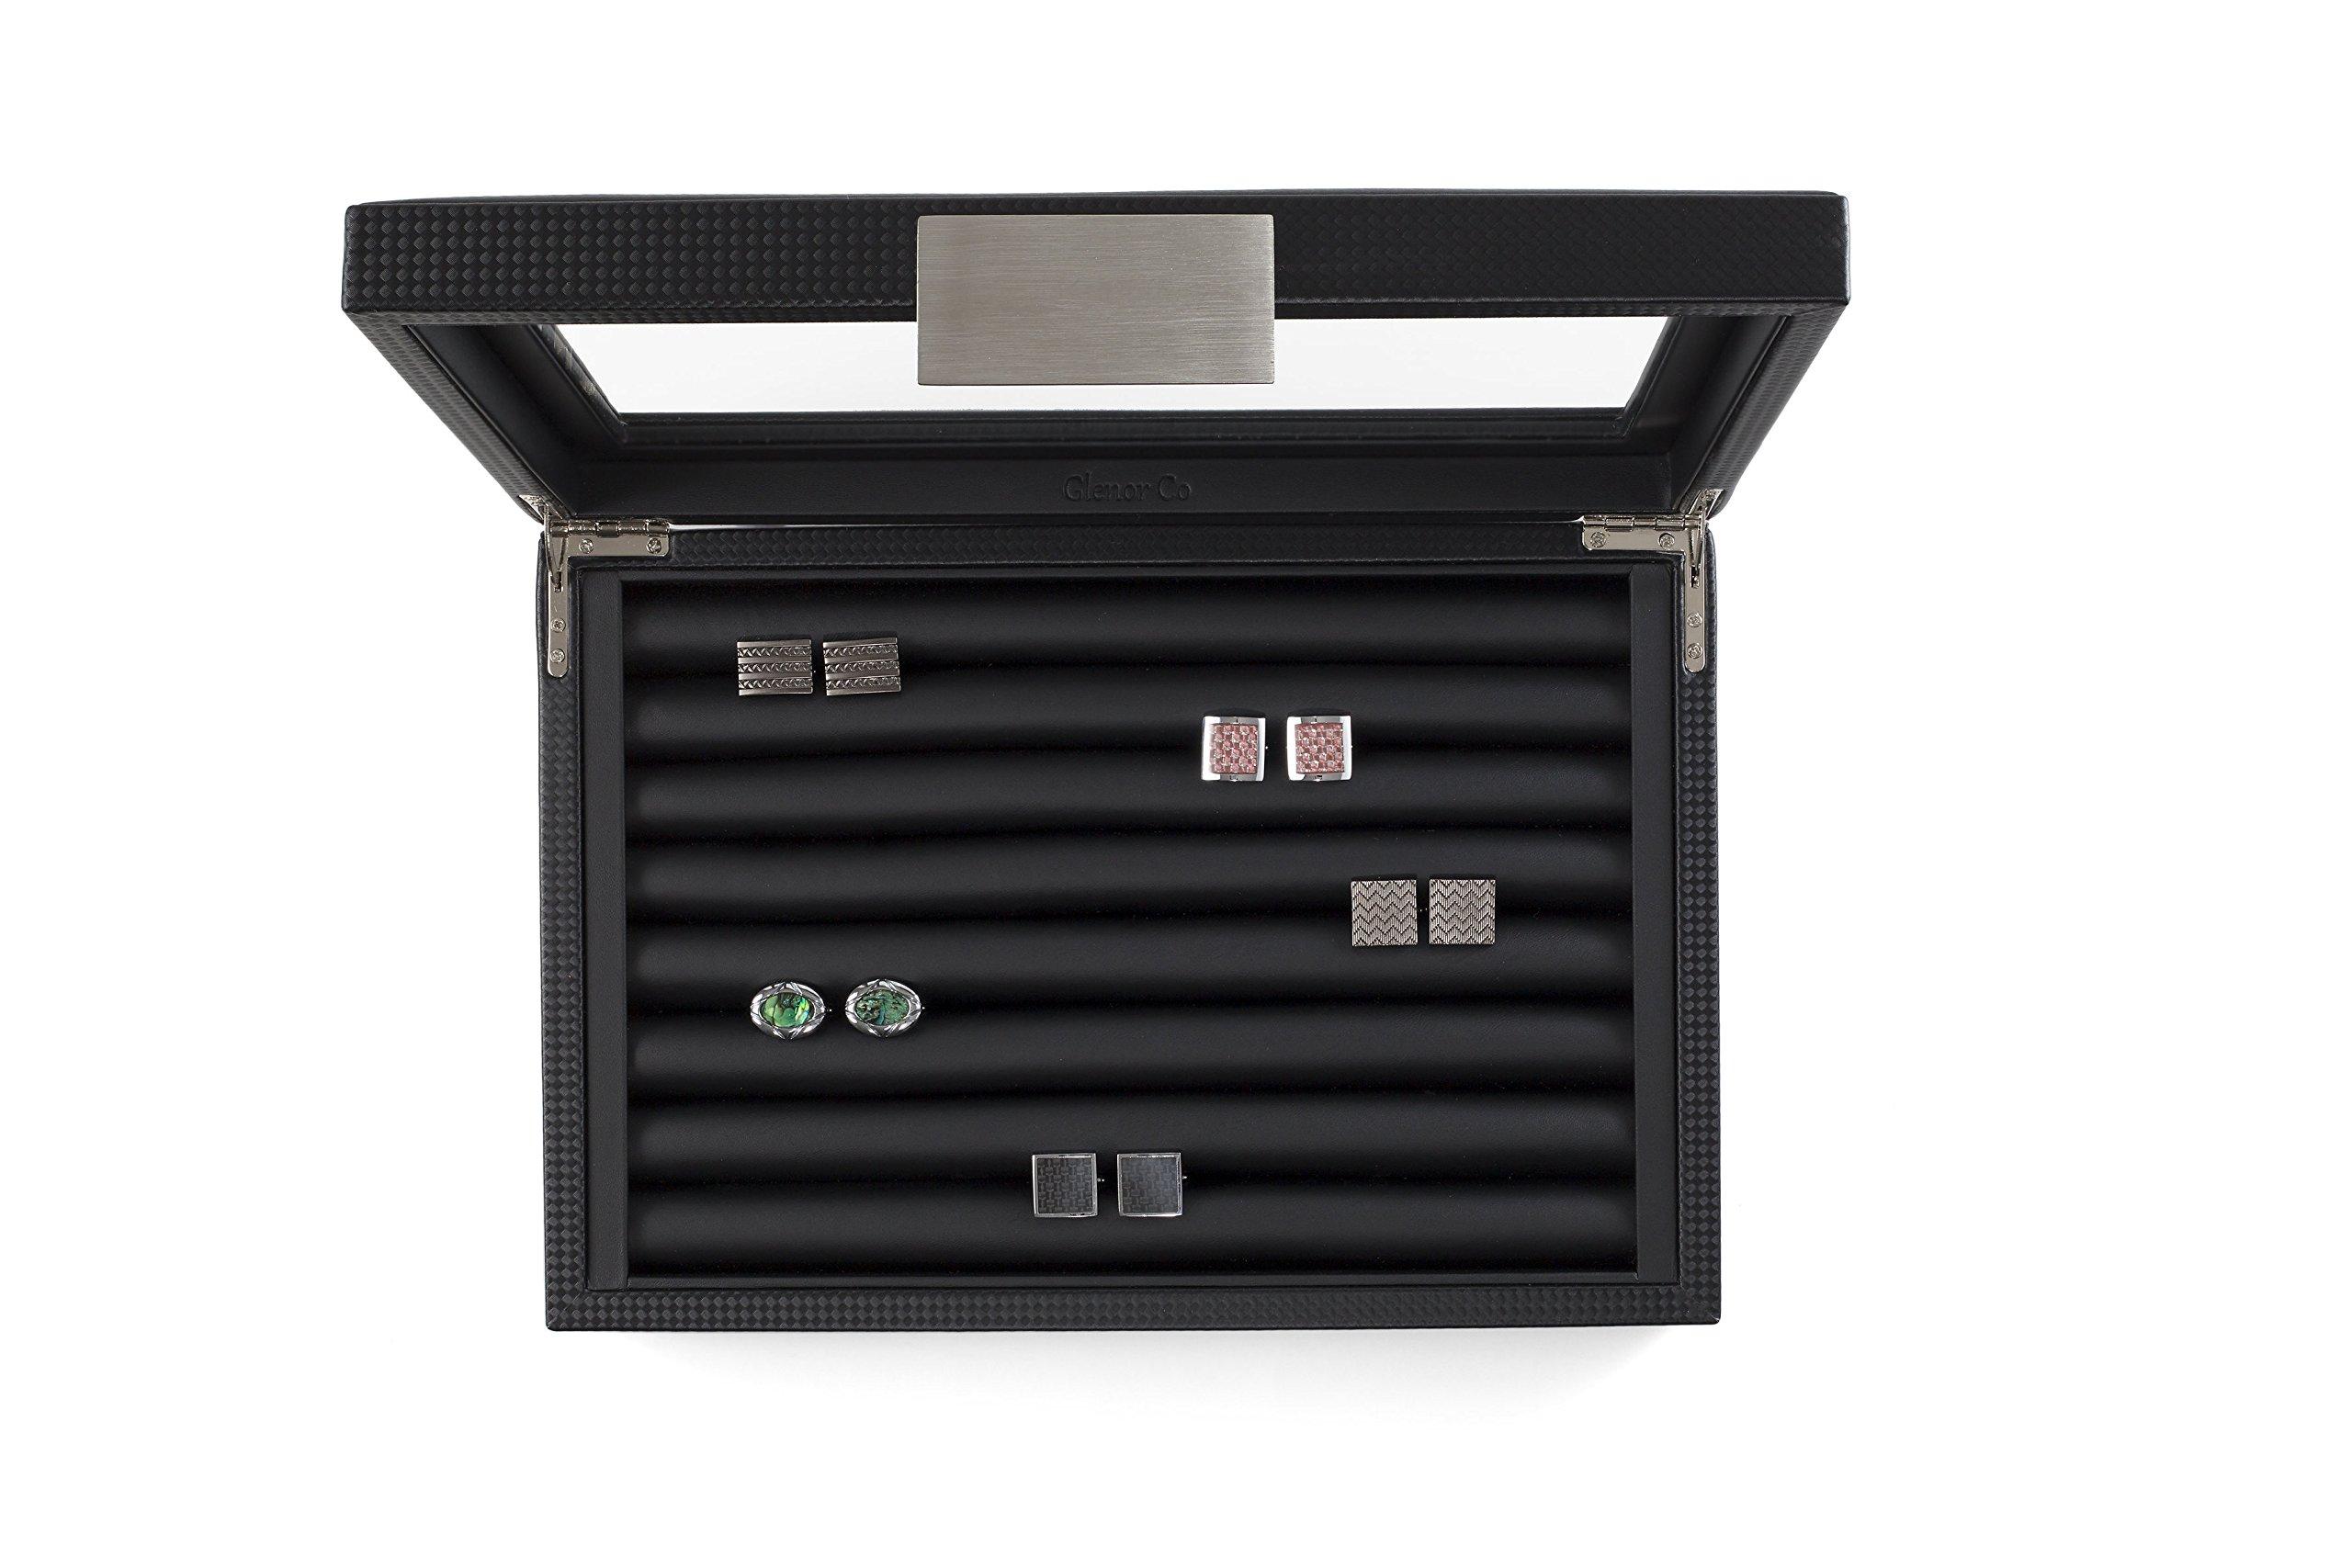 Glenor Co Cufflink Box for Men - Holds 70 Cufflinks - Luxury Display Jewelry Case -Carbon Fiber Design - Metal Buckle Holder, Large Glass Top - Black by Glenor Co (Image #3)